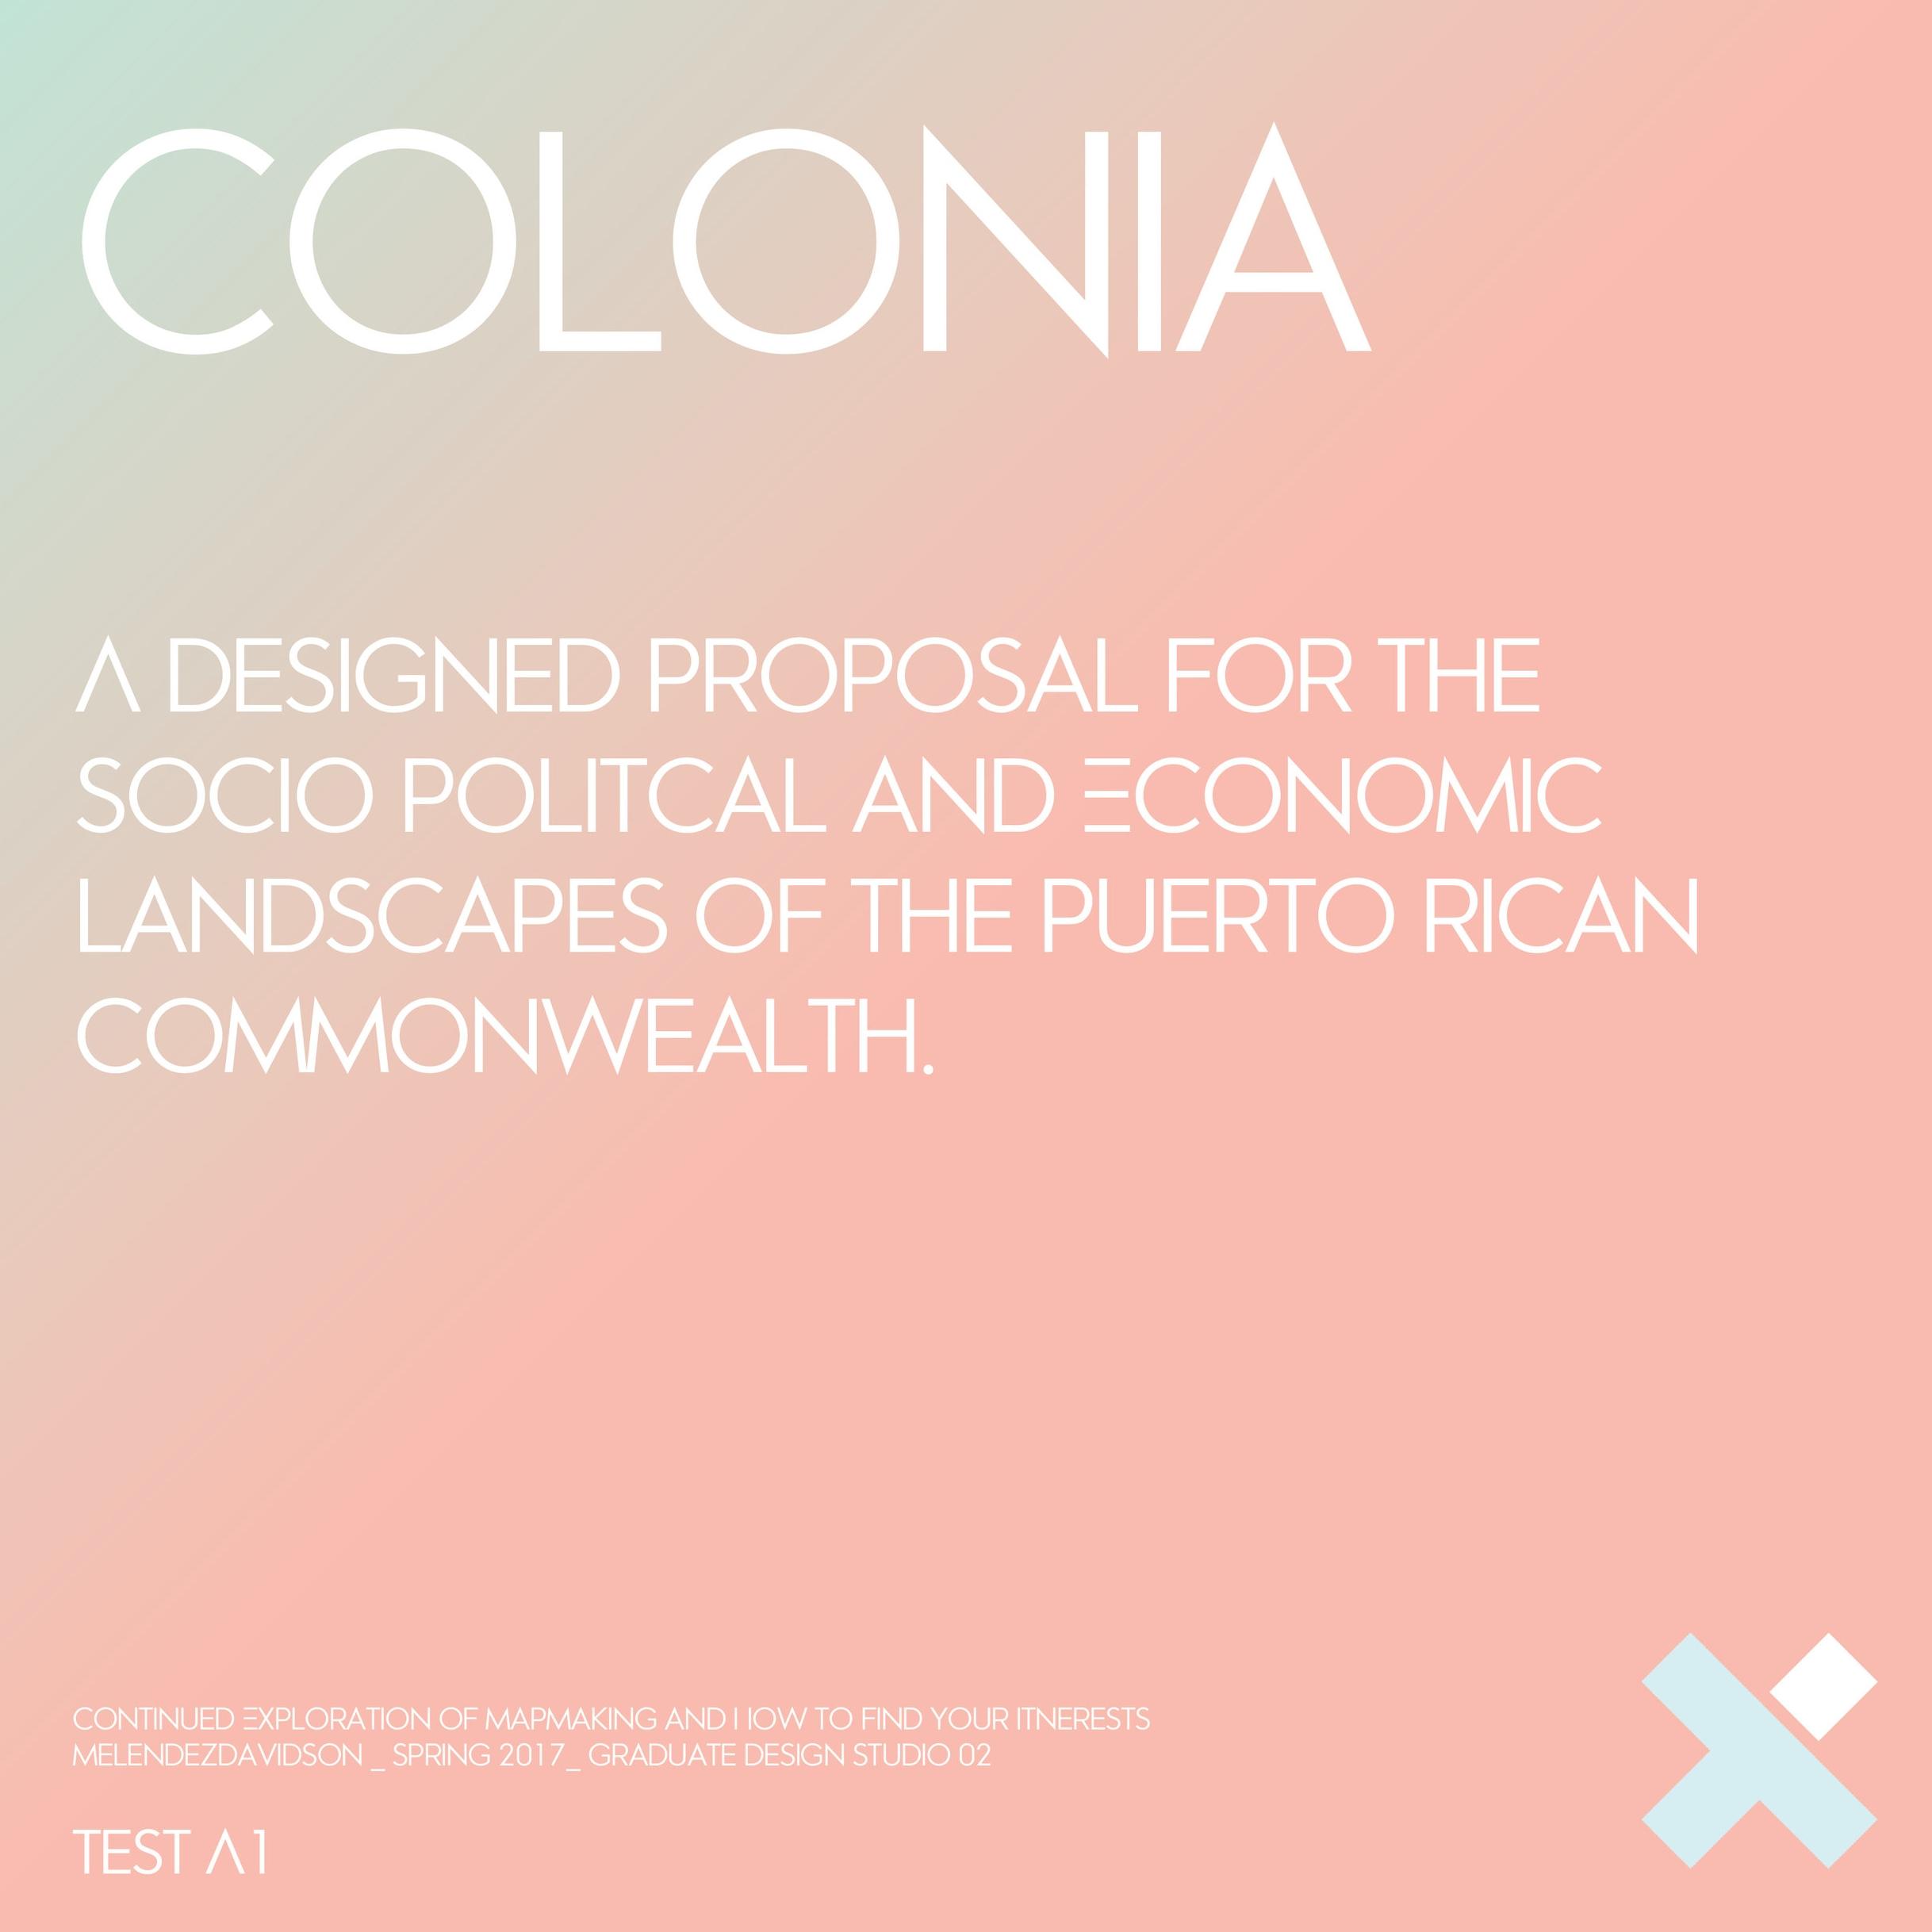 COLONIA BOARDS-01-01.jpg